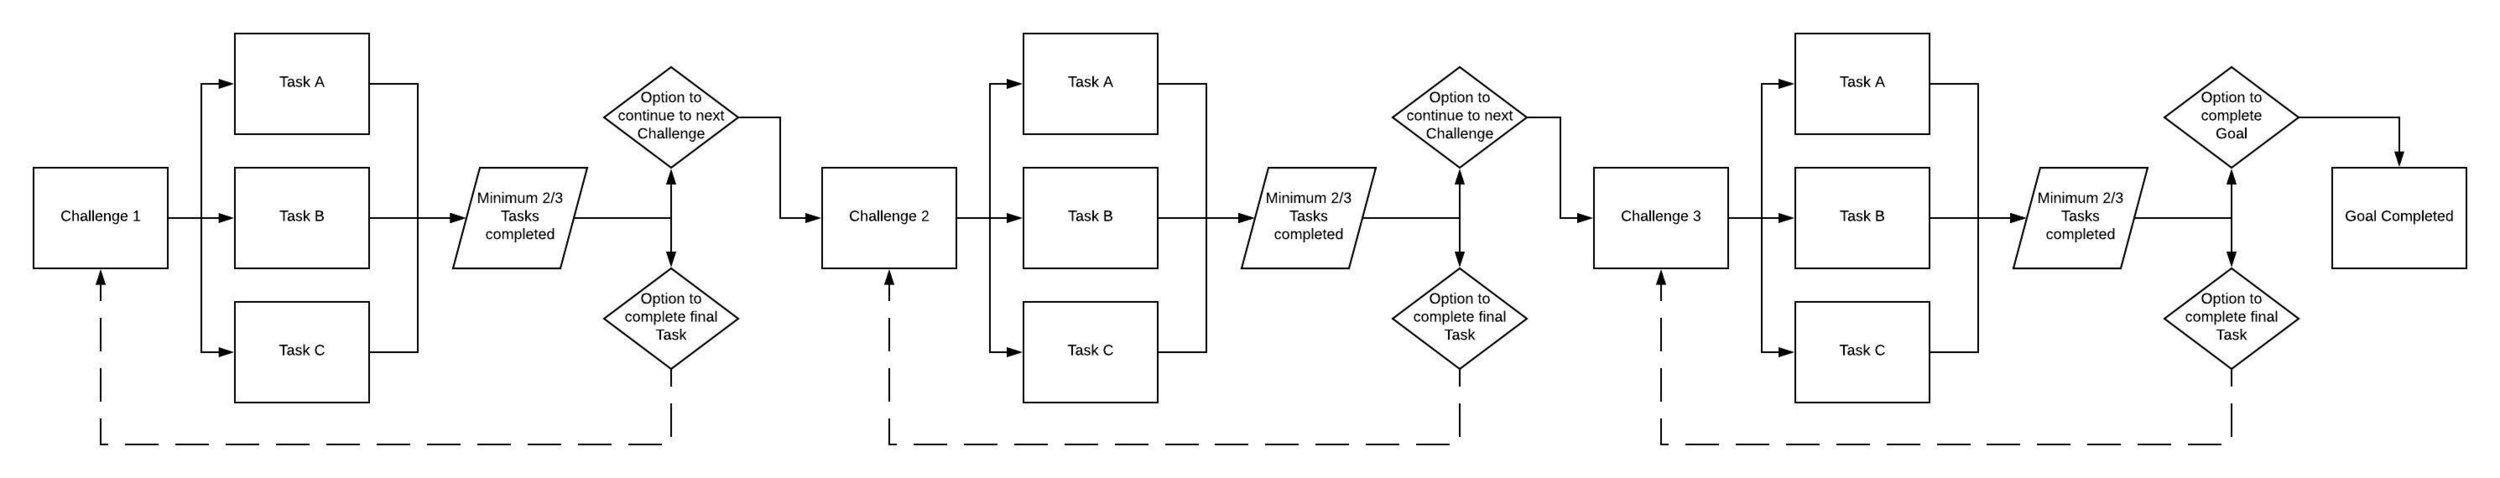 Blank Diagram (1).jpeg